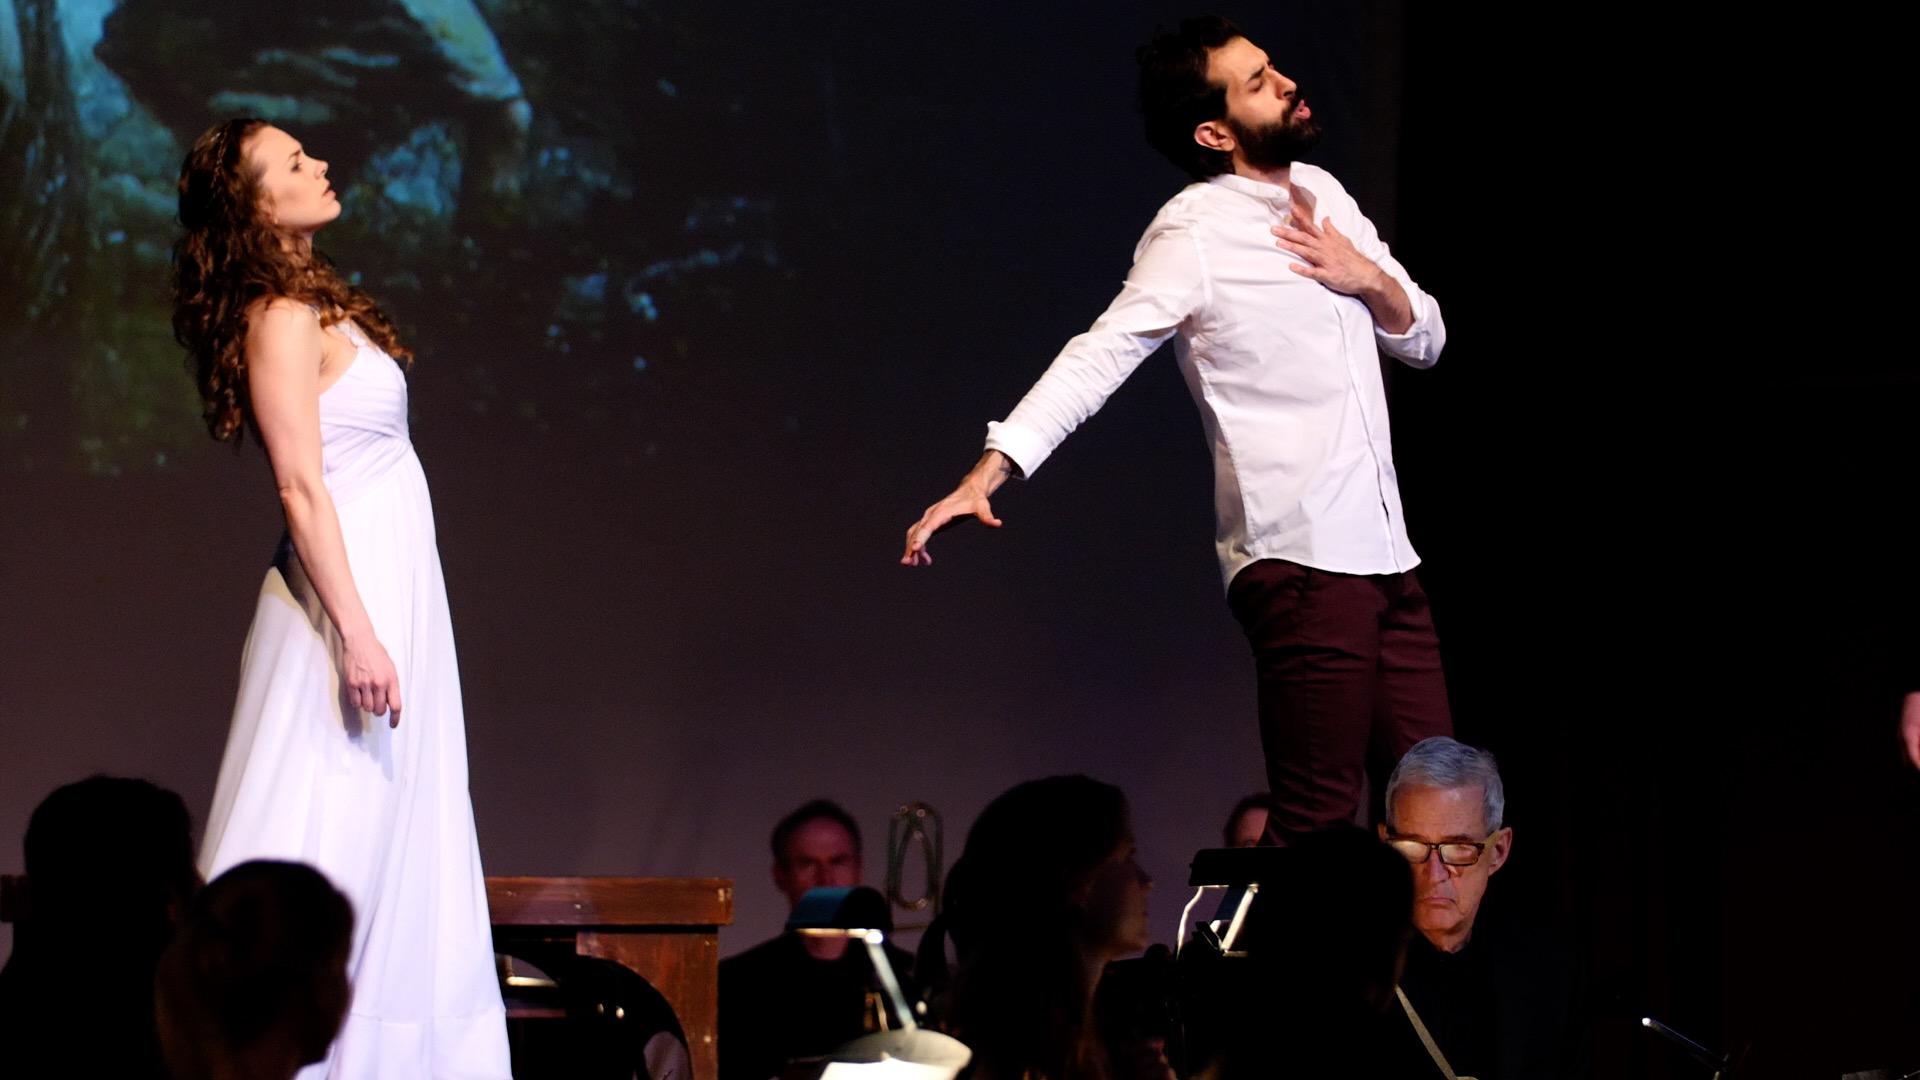 Karim leading Erica.jpg